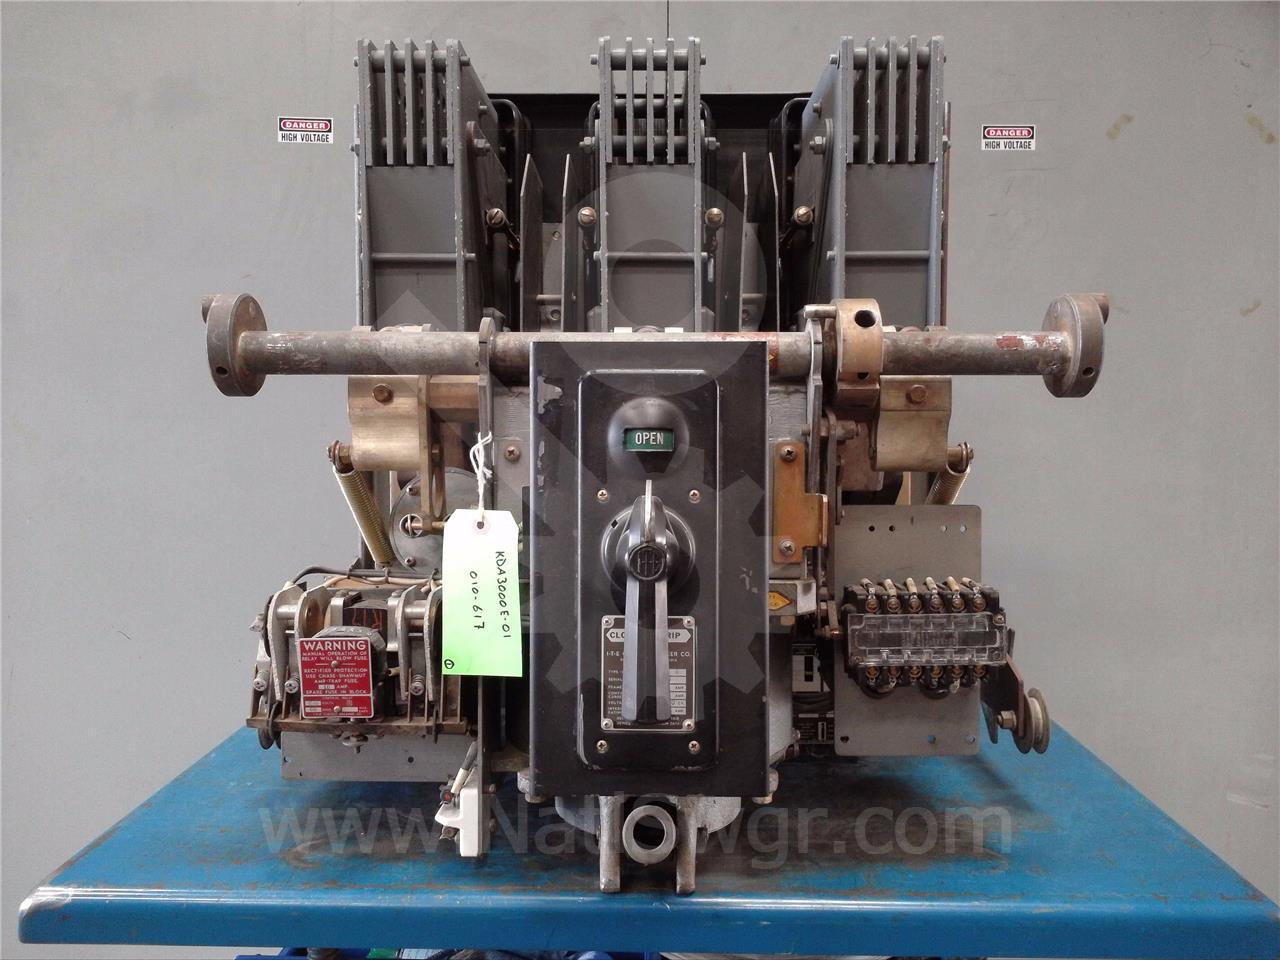 KDA-3000 3000A ITE EO/DO 230VAC CONTROL, 115VAC TRIP, OD-1 3000A